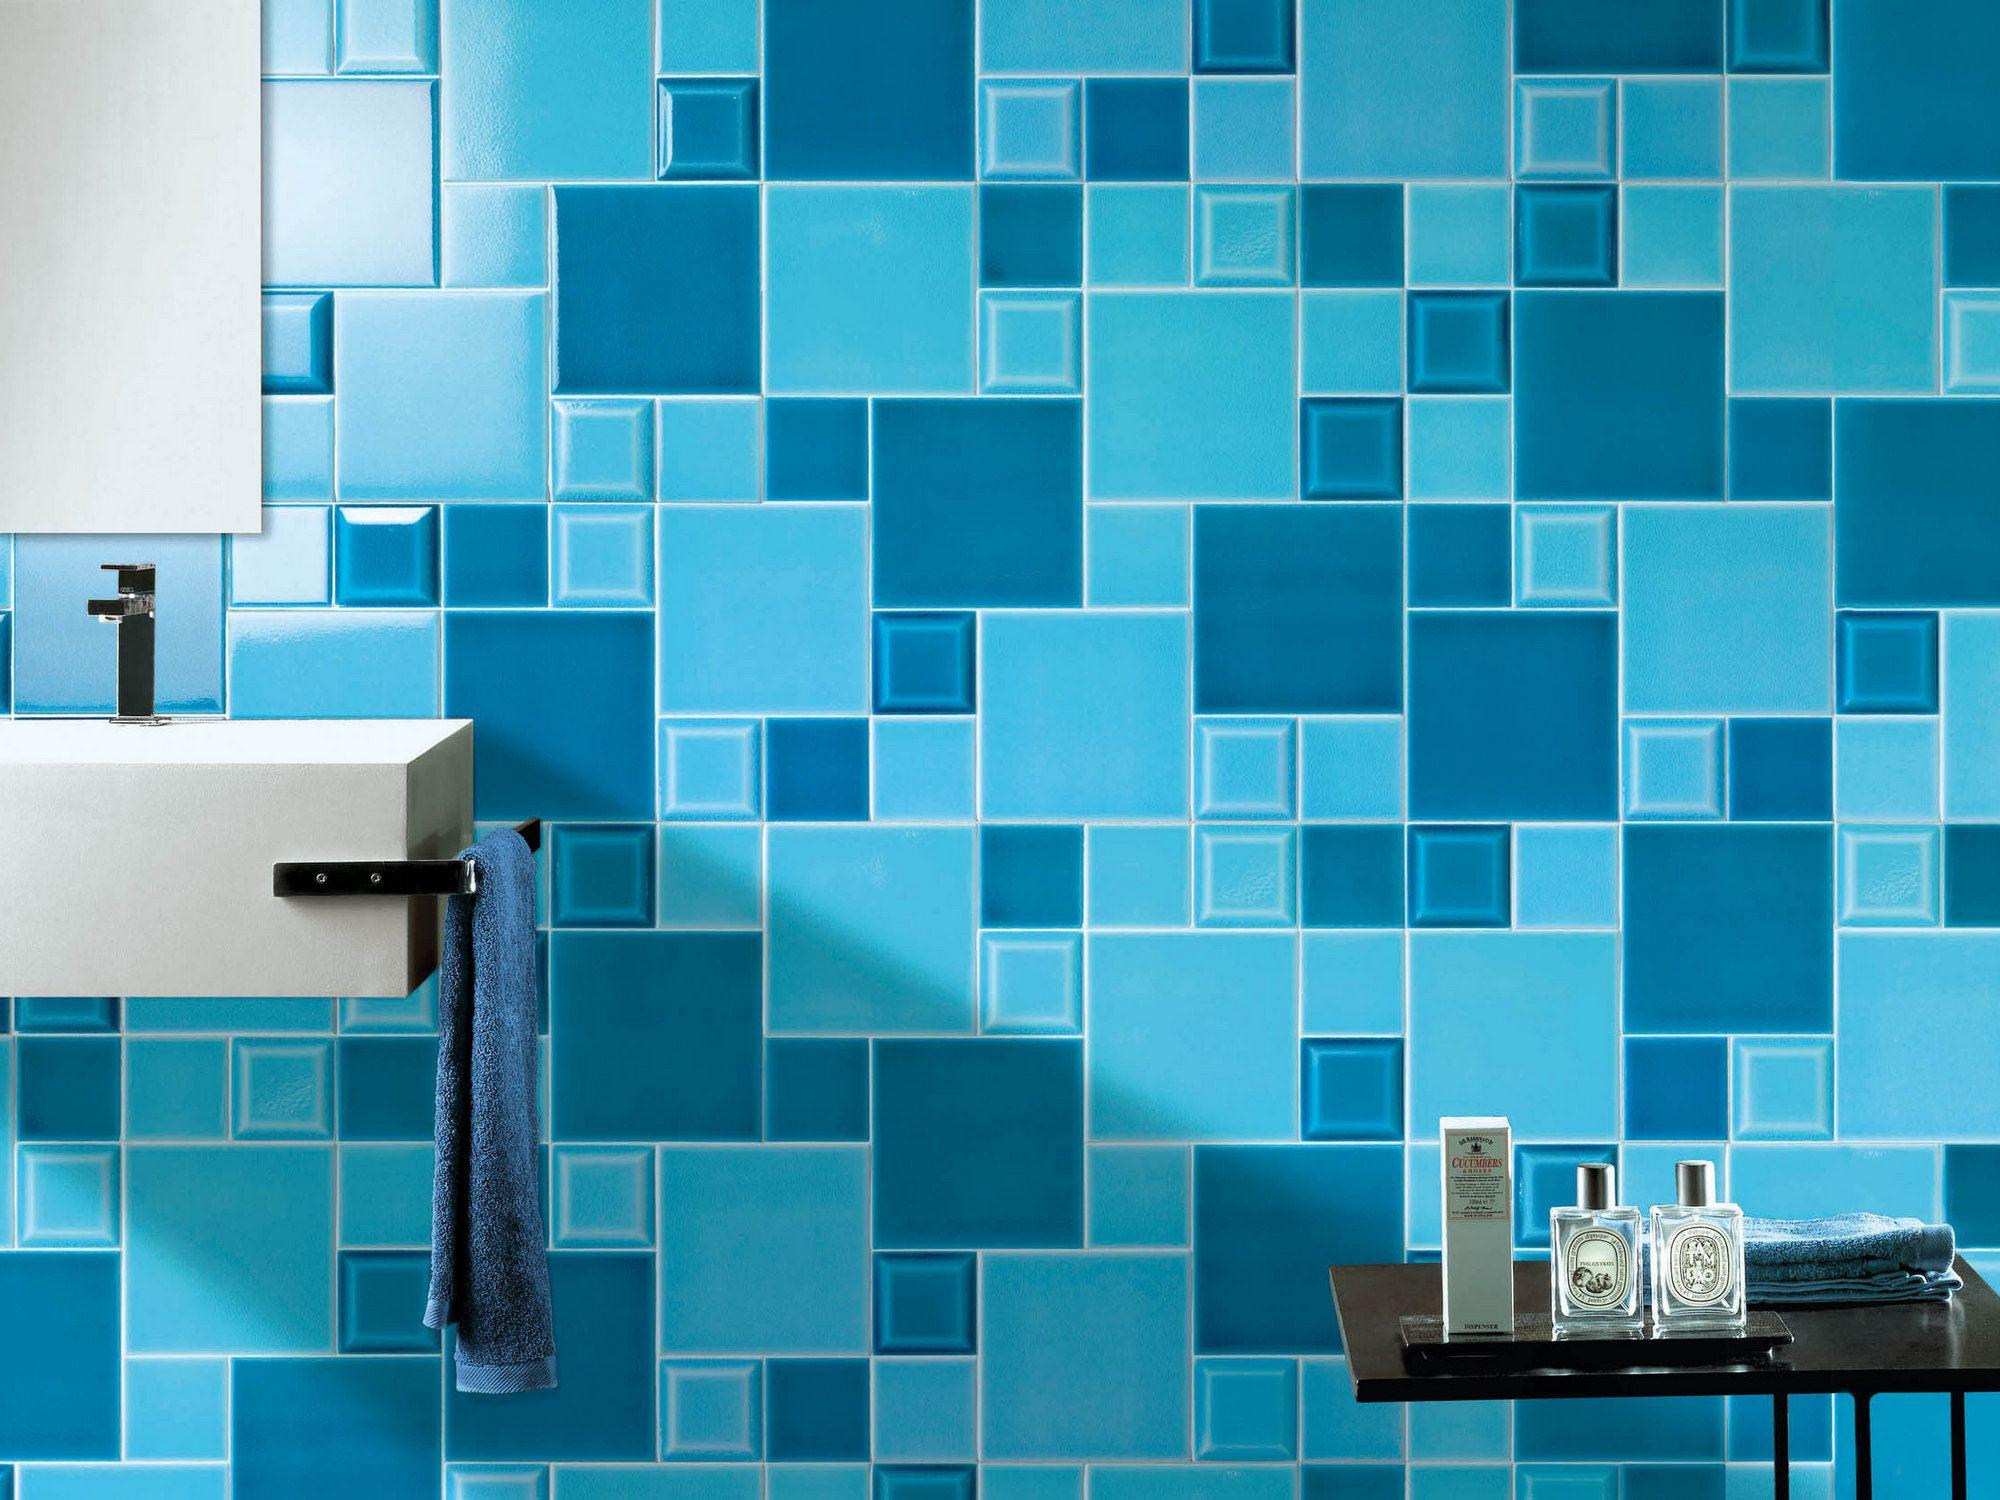 PITRIZZA Wall tiles by Cerasarda | Bathroom | Pinterest | Wall tiles ...